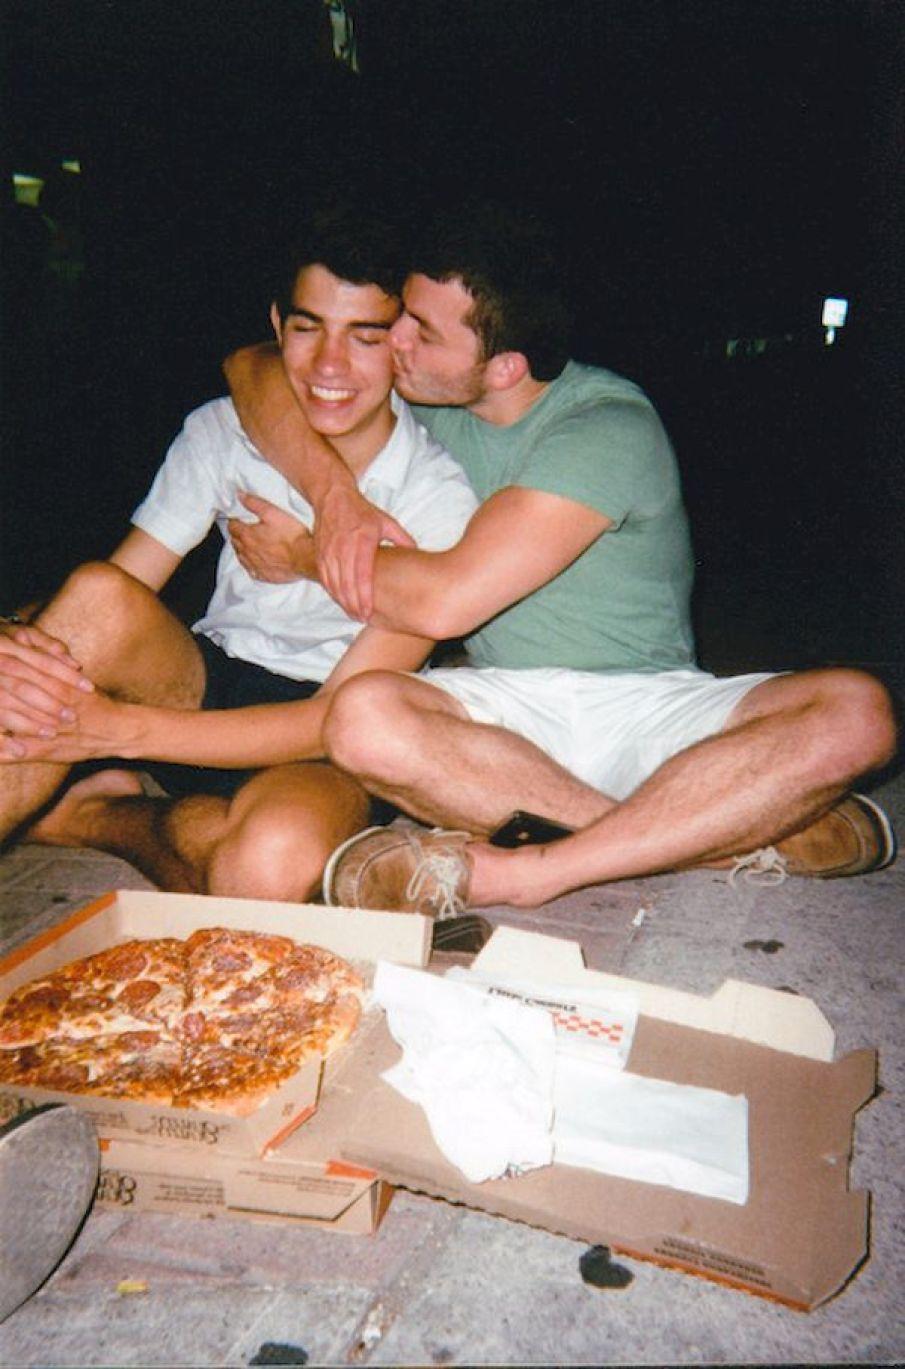 amateur-gay-couples-in-love-gay-kissing-real-amateur-sexy-men-boyfriend-gay-men-bi-seemybf-0001